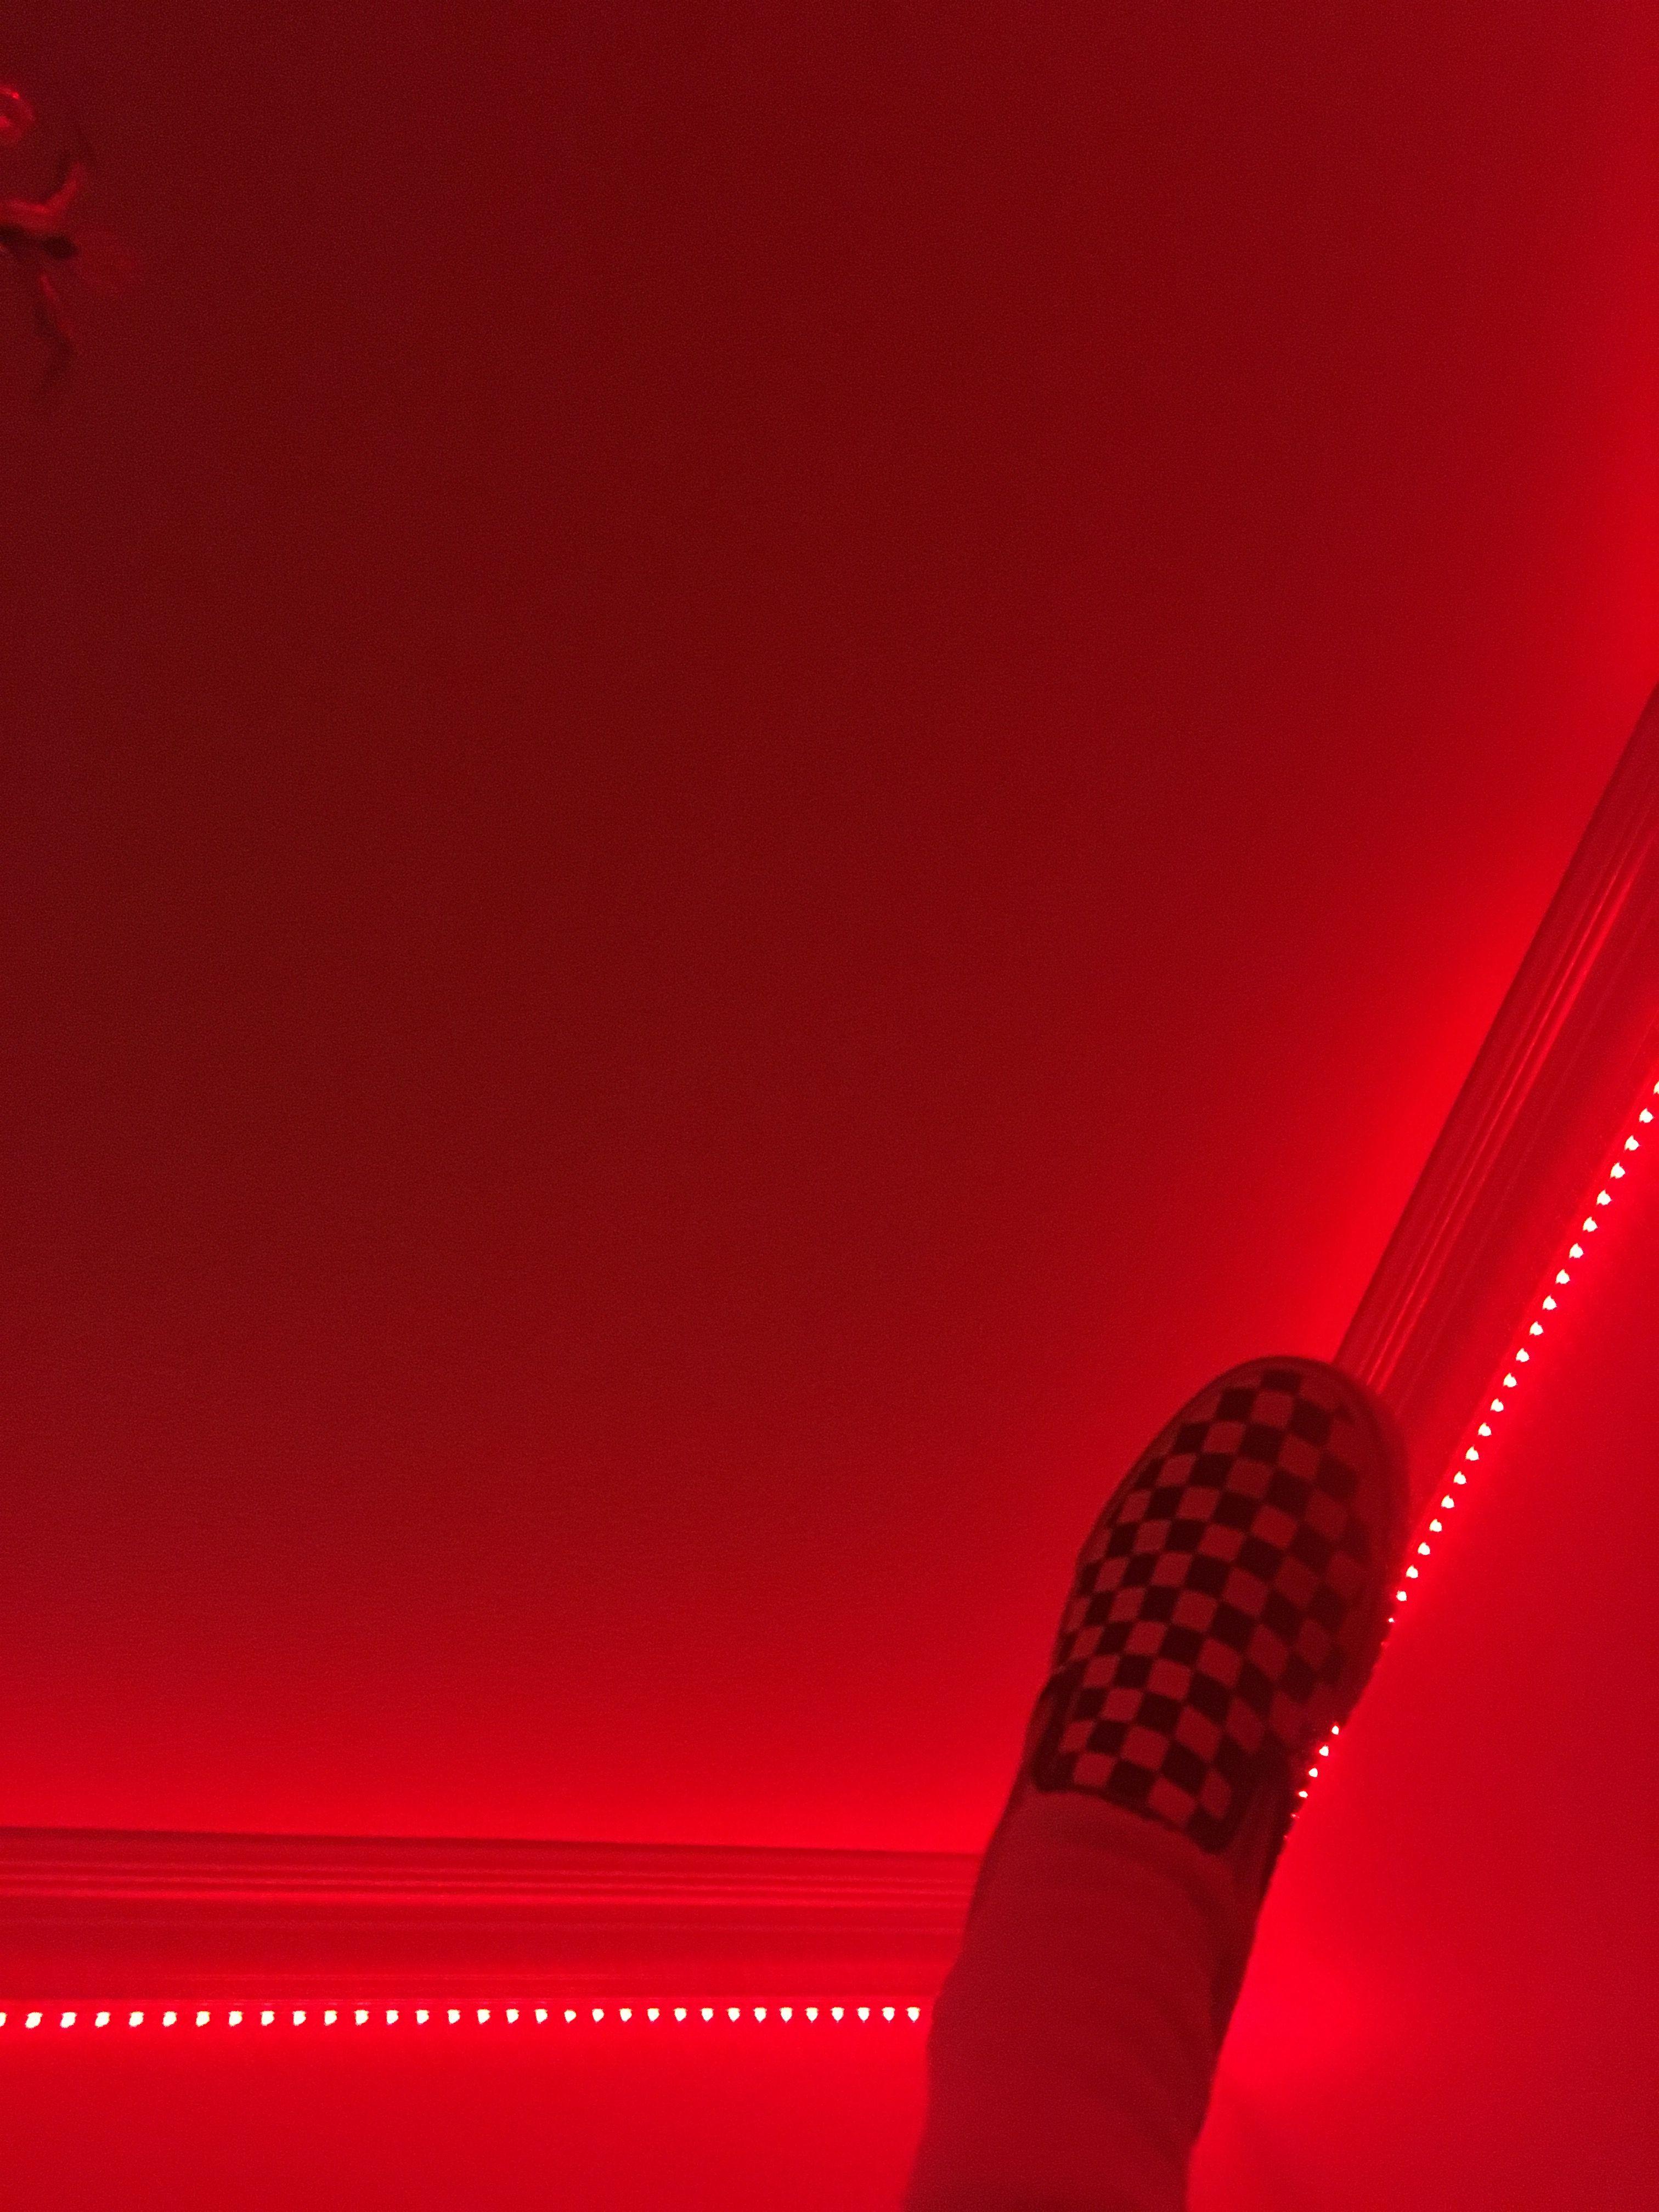 red aesthetic Red aesthetic Pinterest Red aesthetic